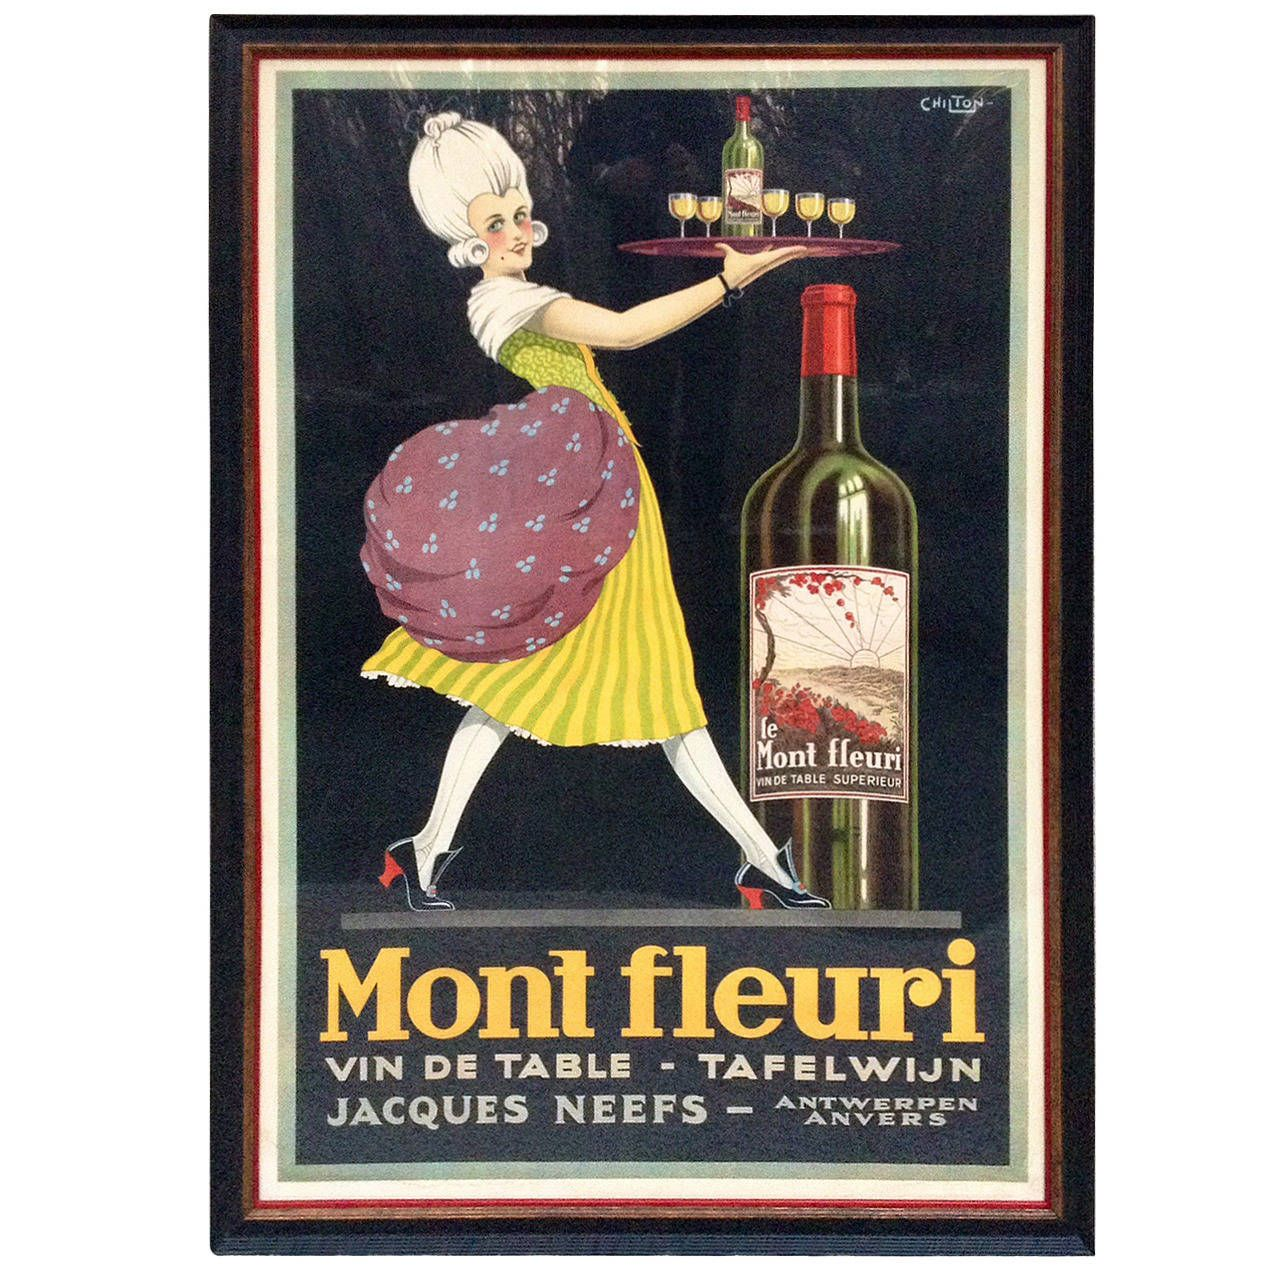 Rare Chilton French Wine Poster Mont Fleuri Jacques Neefs